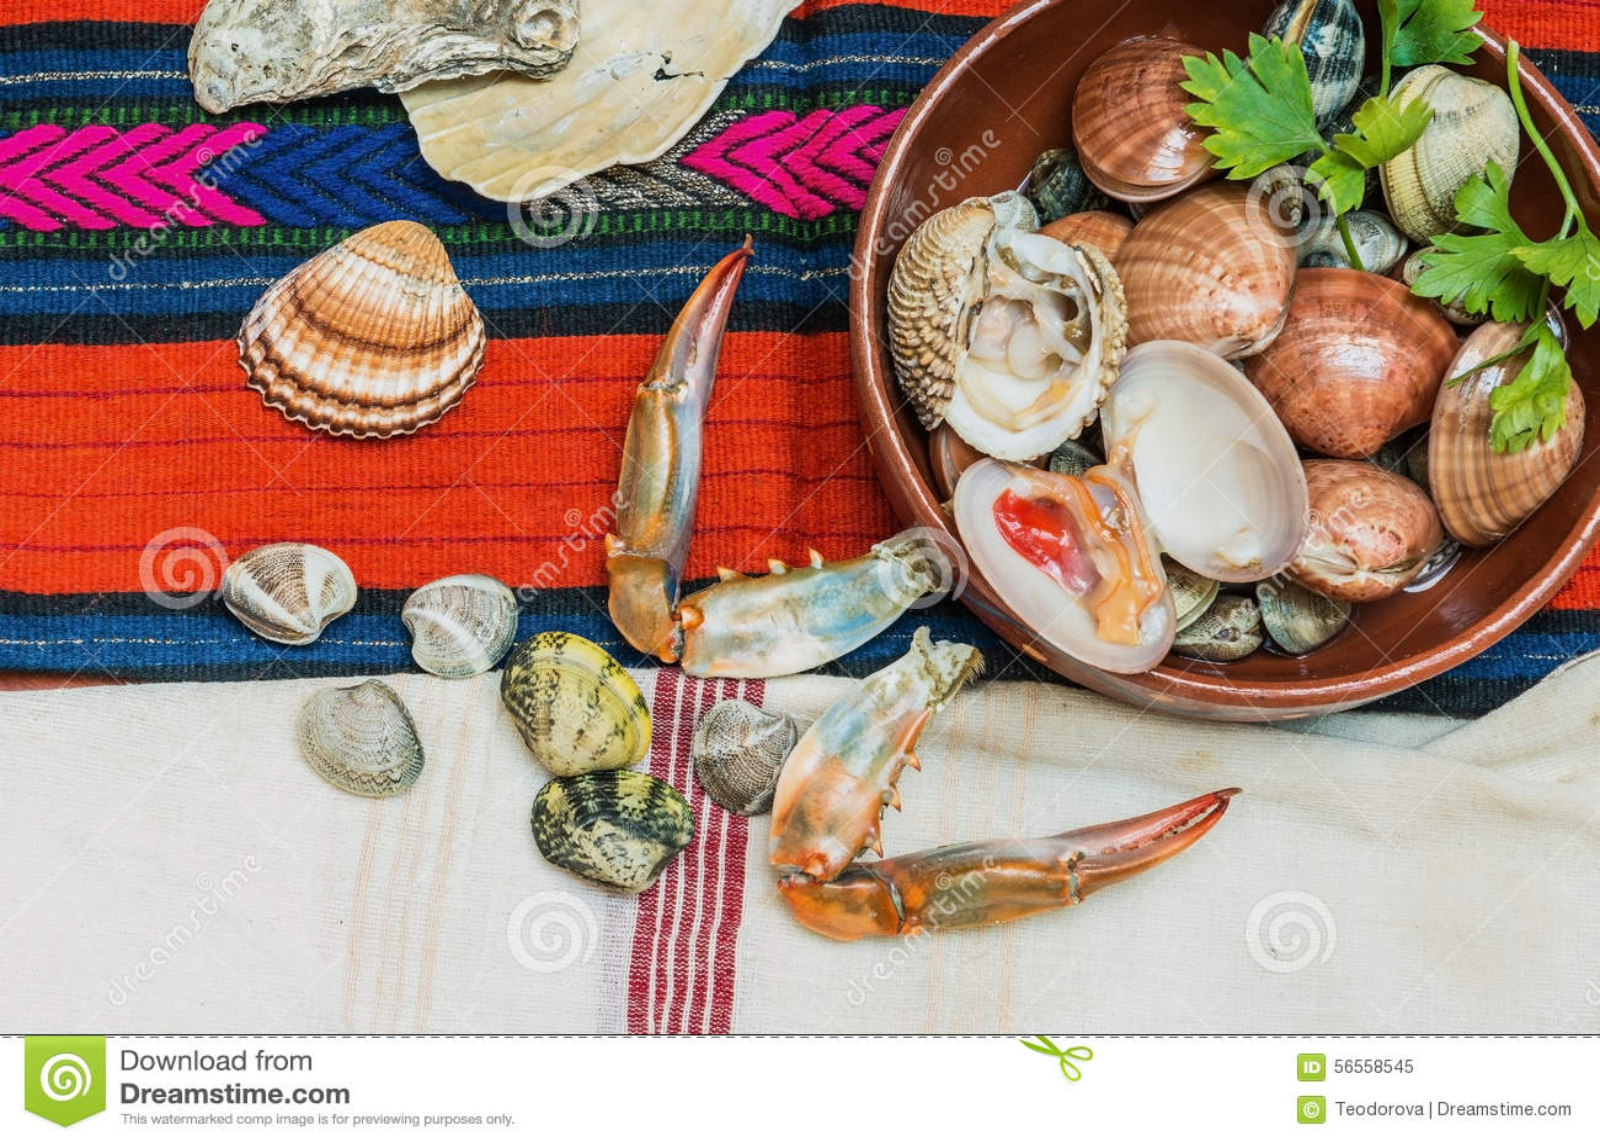 Download Θαλασσινά με τα νύχια και τα κοχύλια καβουριών Στοκ Εικόνα - εικόνα από ιώδιο, ψάρια: 56558545